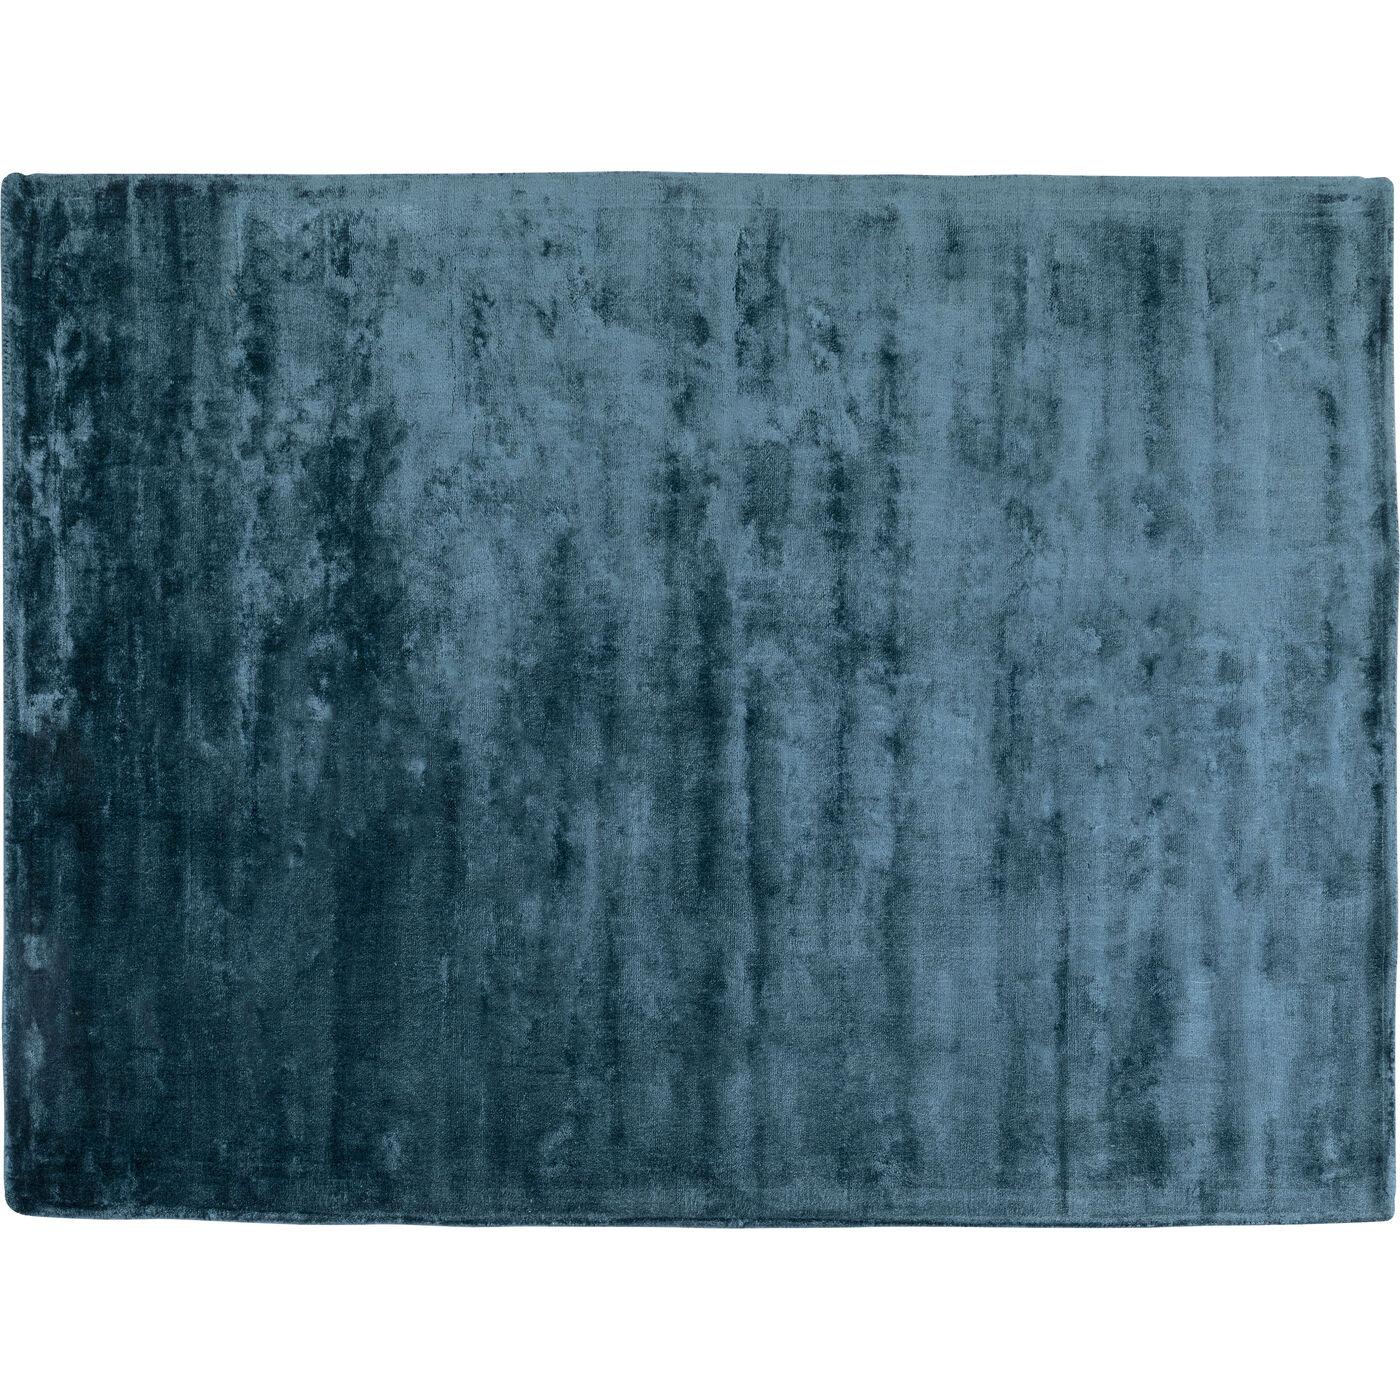 Teppich Cosy Ocean 200x300cm